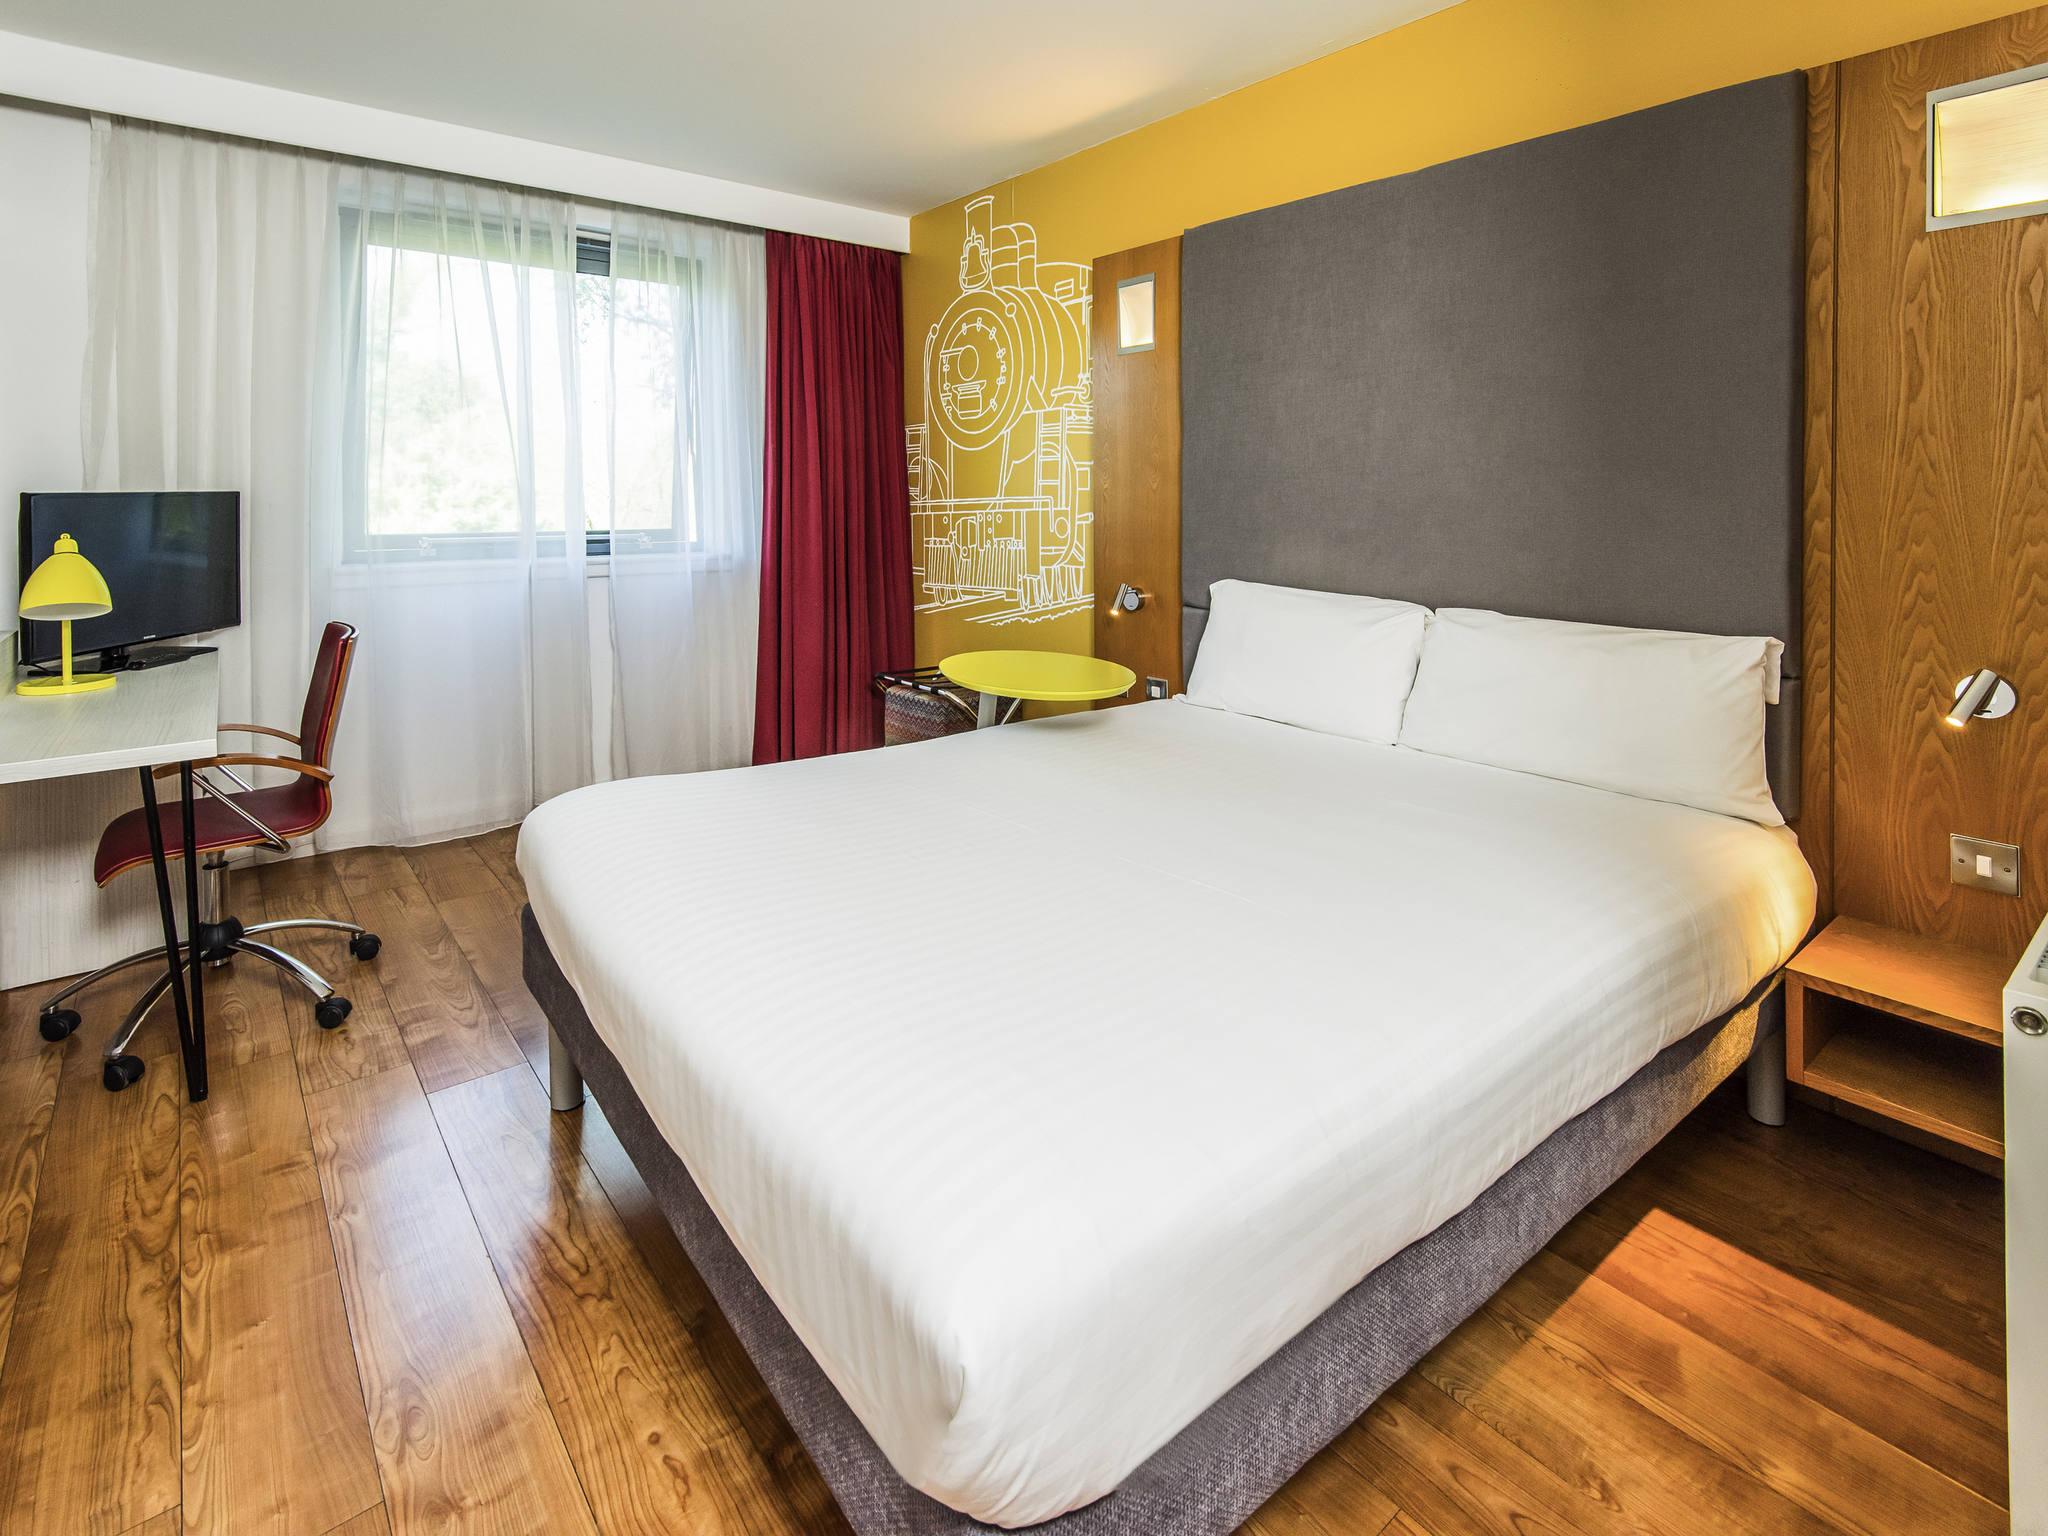 crewe ibis ho hotel near styles hotels in s college bentley gb index p